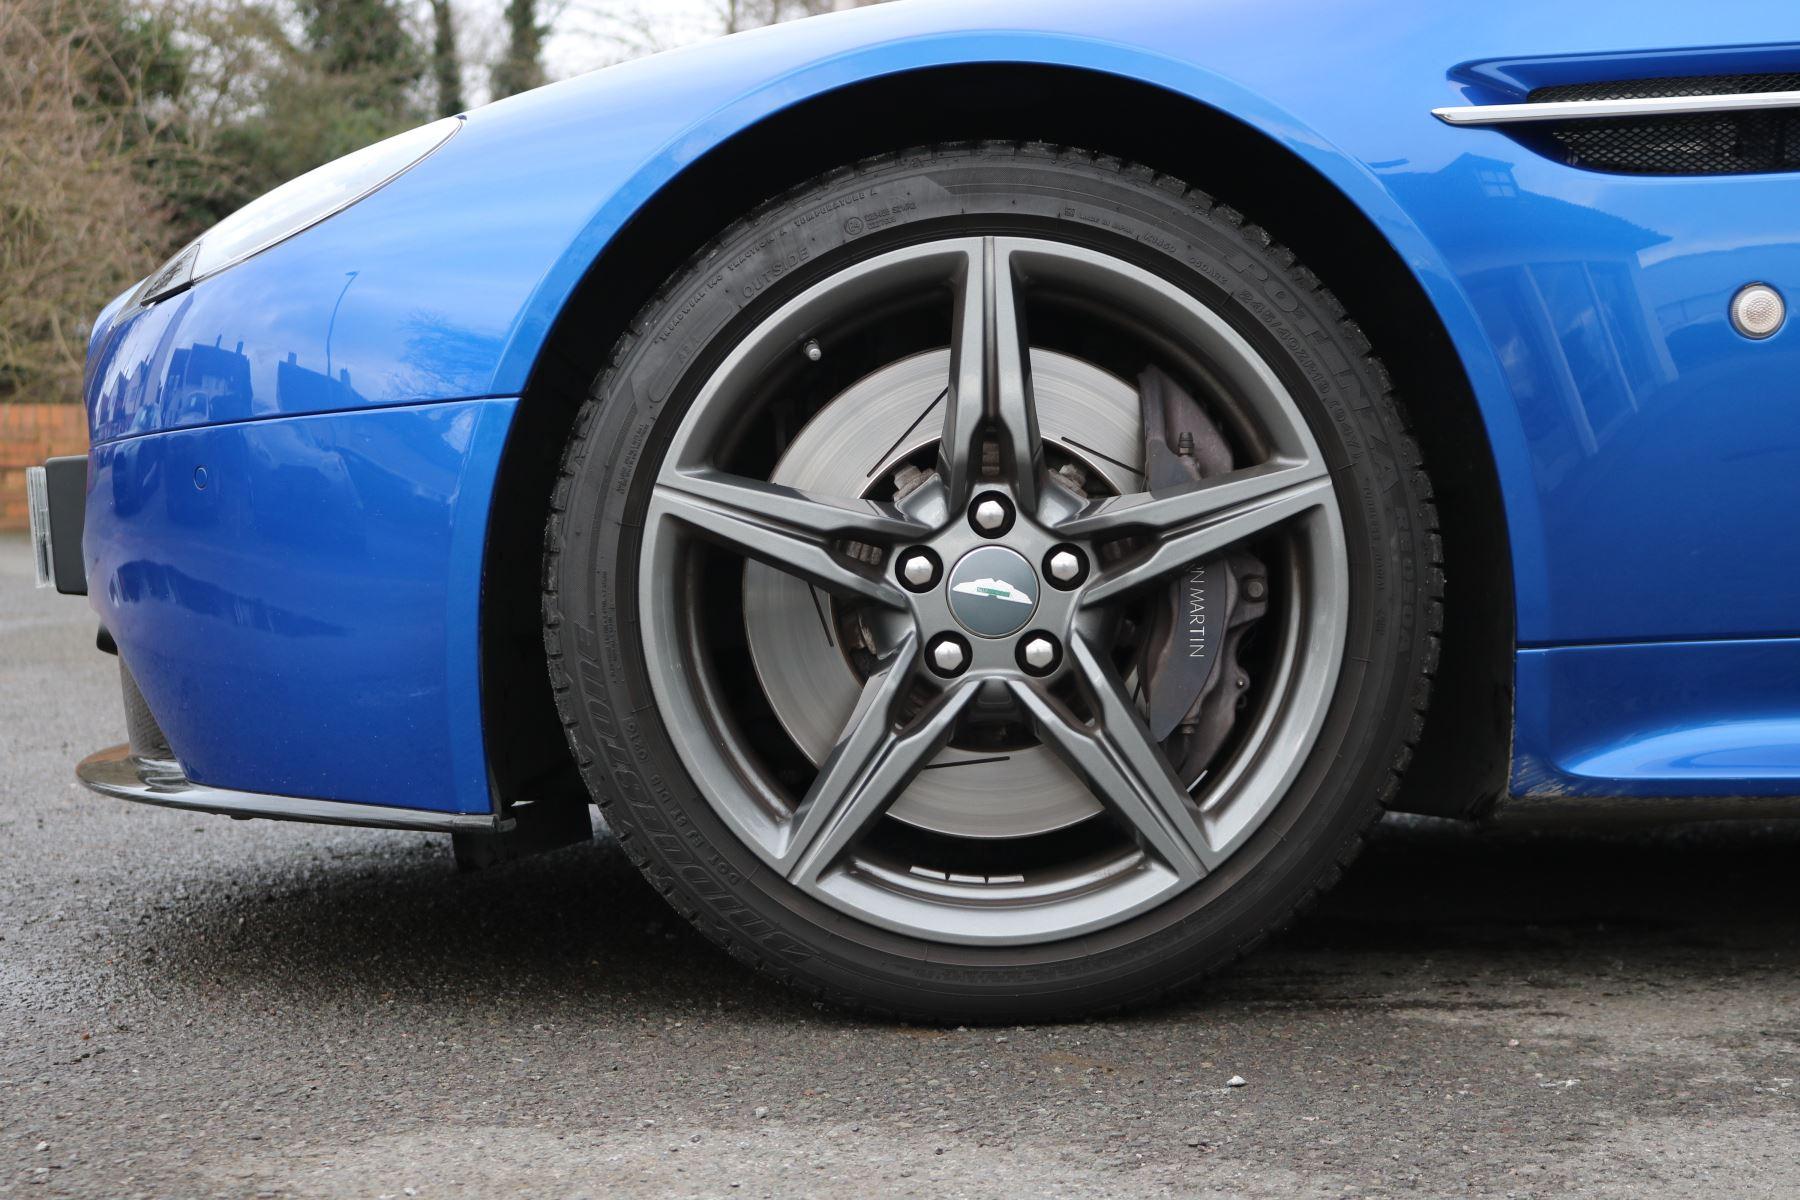 Aston Martin V8 Vantage S S 2dr Sportshift image 13